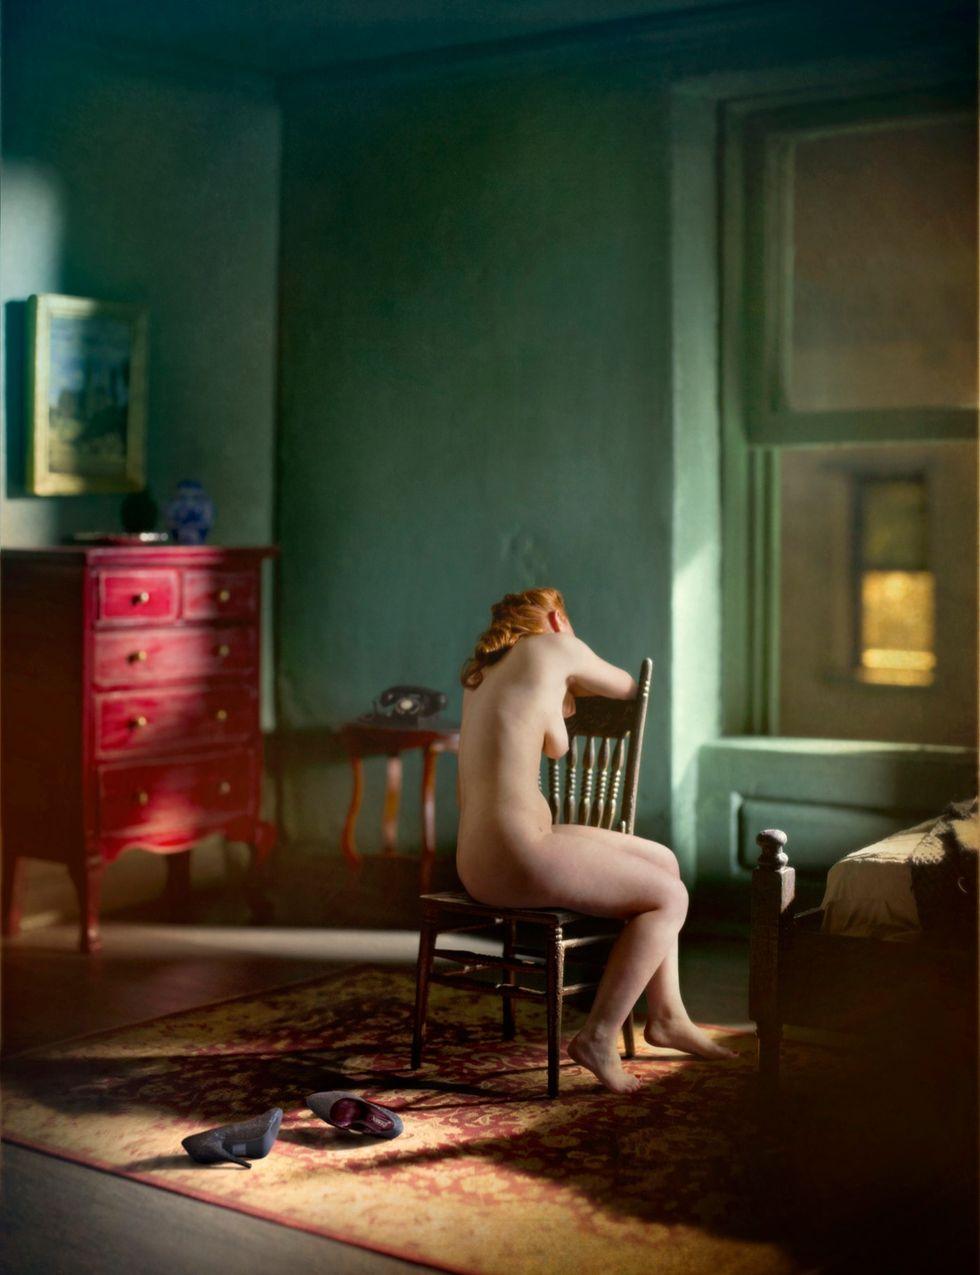 Hopperiana, la fotografia ispirata da Edward Hopper